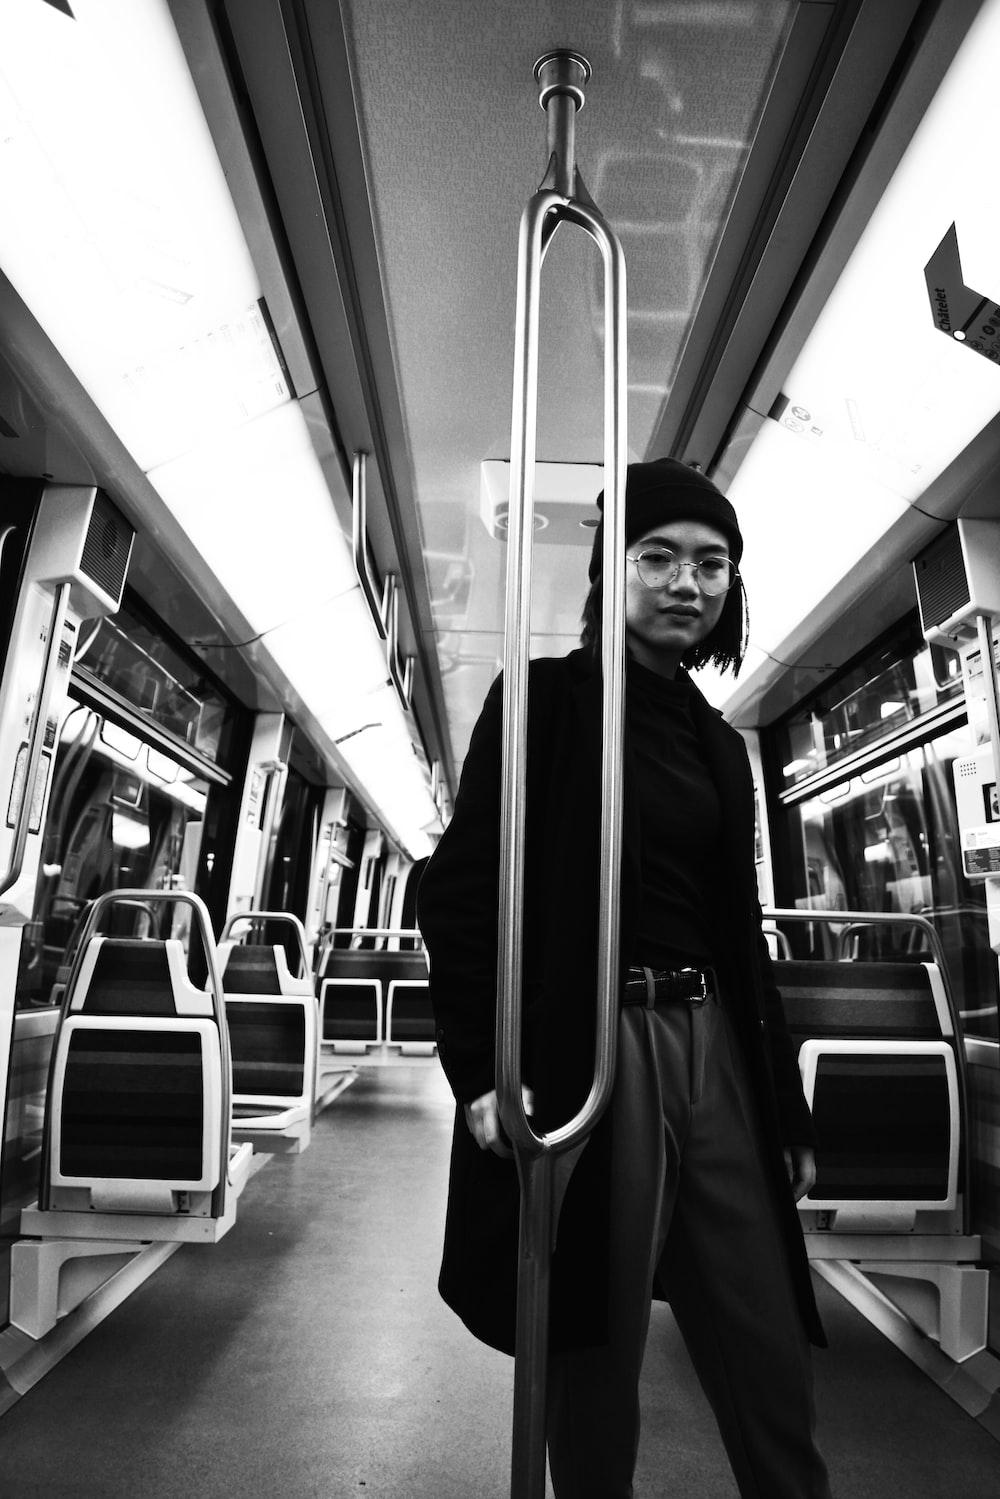 greyscale photo of woman in train